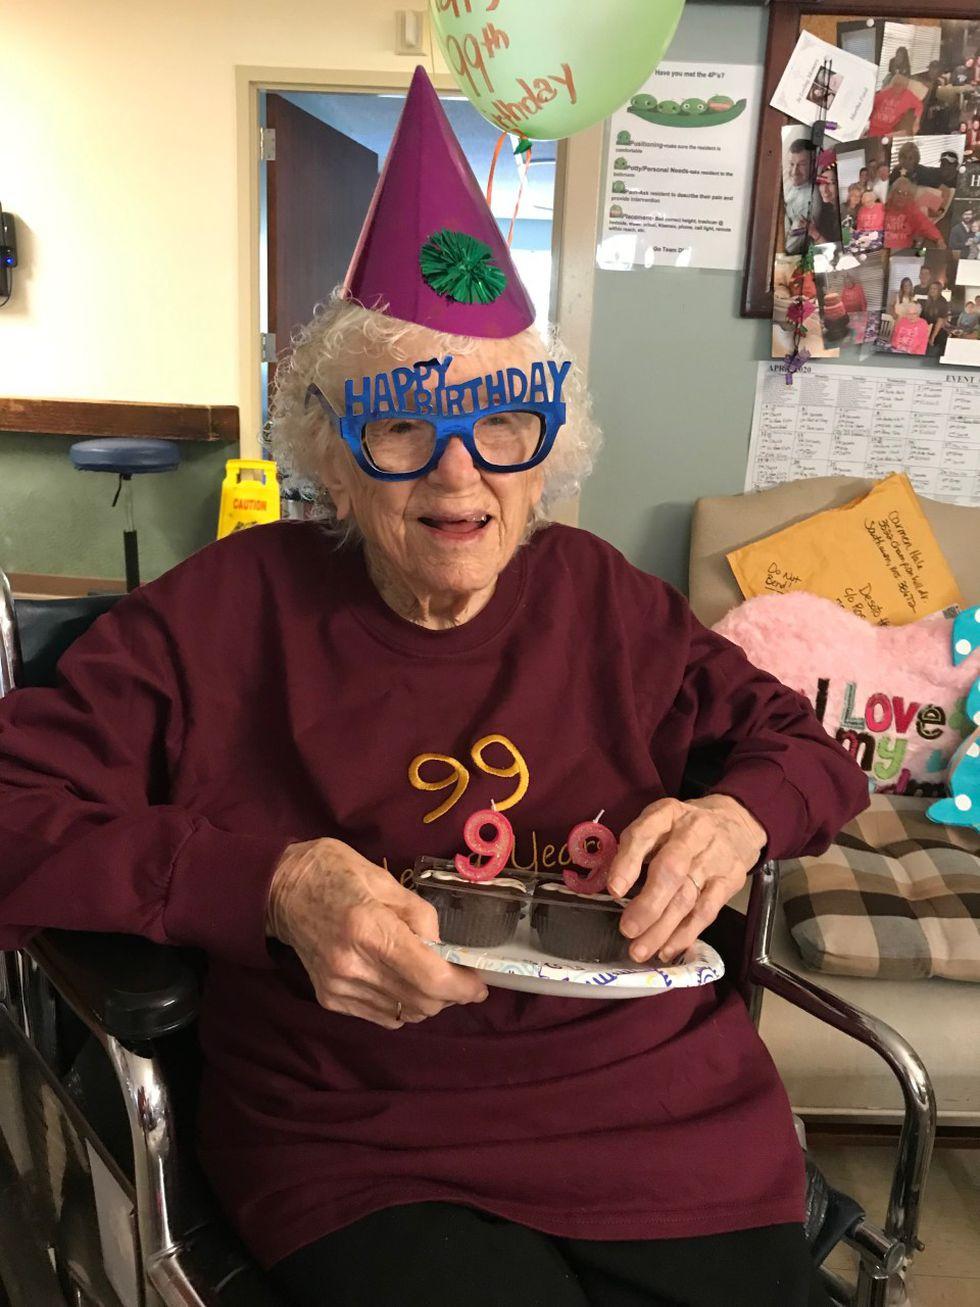 Family visits, celebrates grandmother's 99th birthday through window